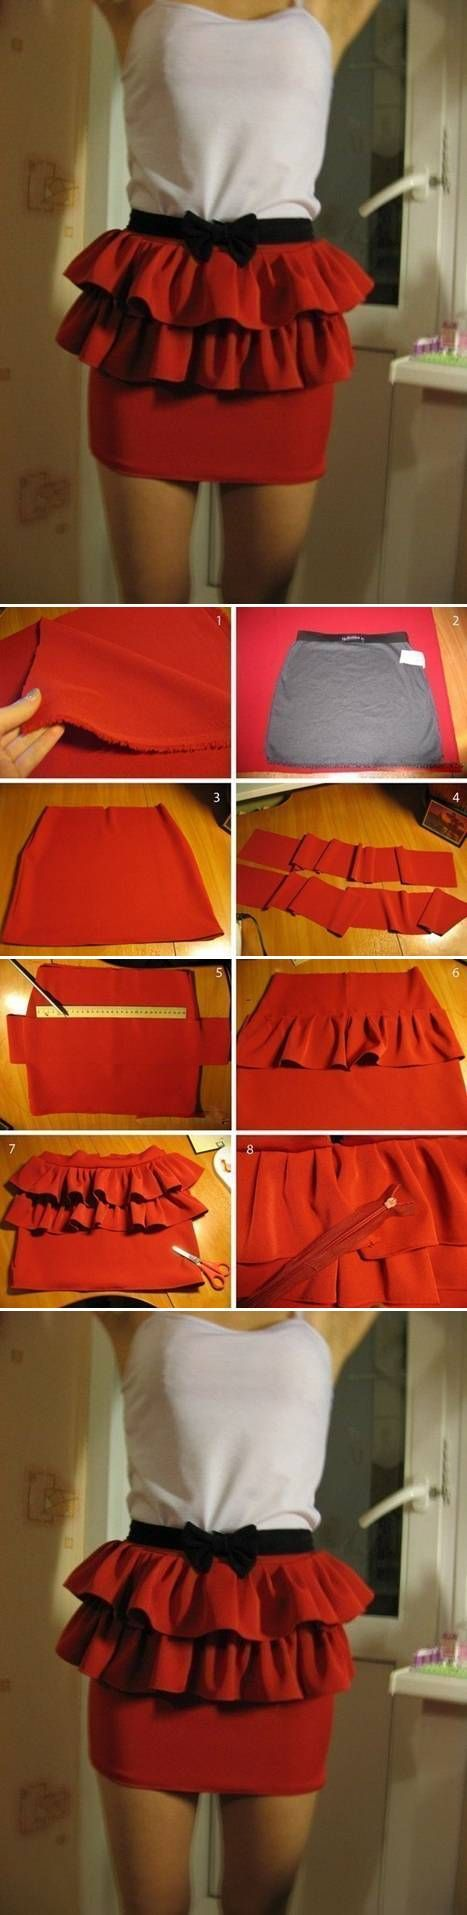 DIY Easy Skirt Modification DIY Projects | UsefulDIY.com Follow us on Facebook ==> https://www.facebook.com/UsefulDiy